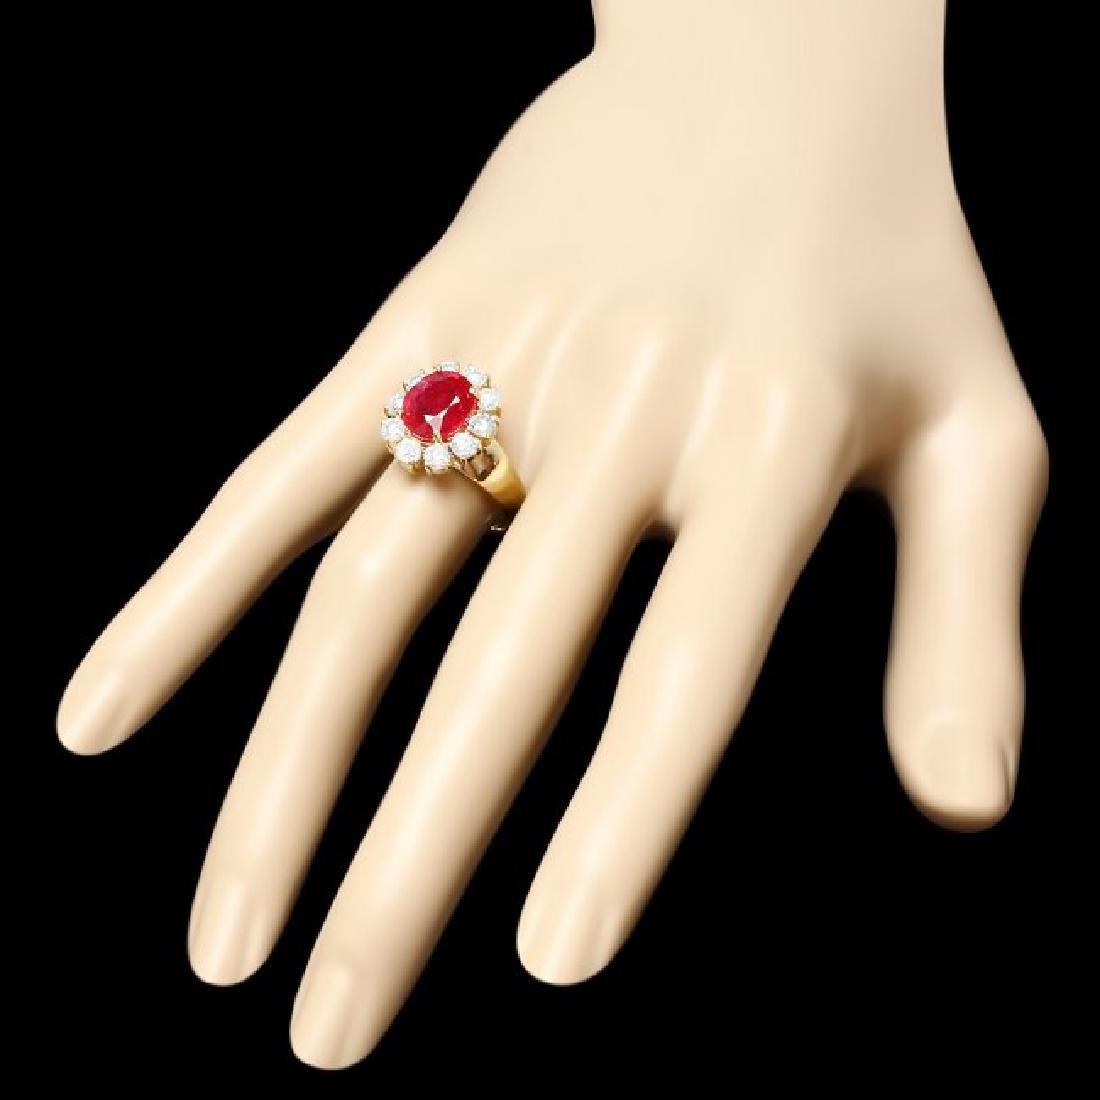 14k Yellow Gold 3.50ct Ruby 1.30ct Diamond Ring - 3